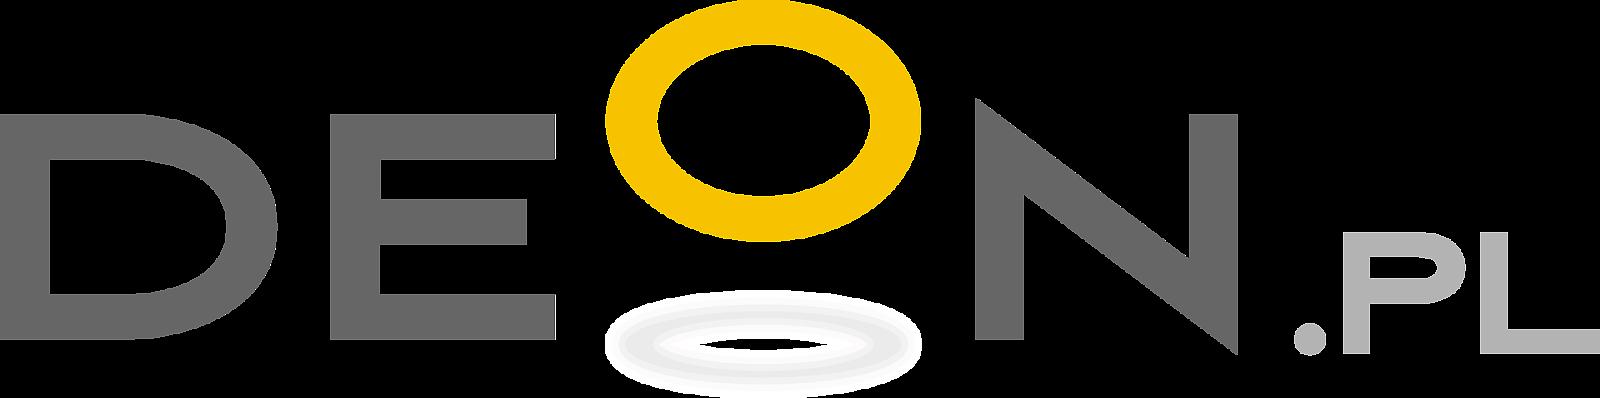 deon.pl.png [31.74 KB]